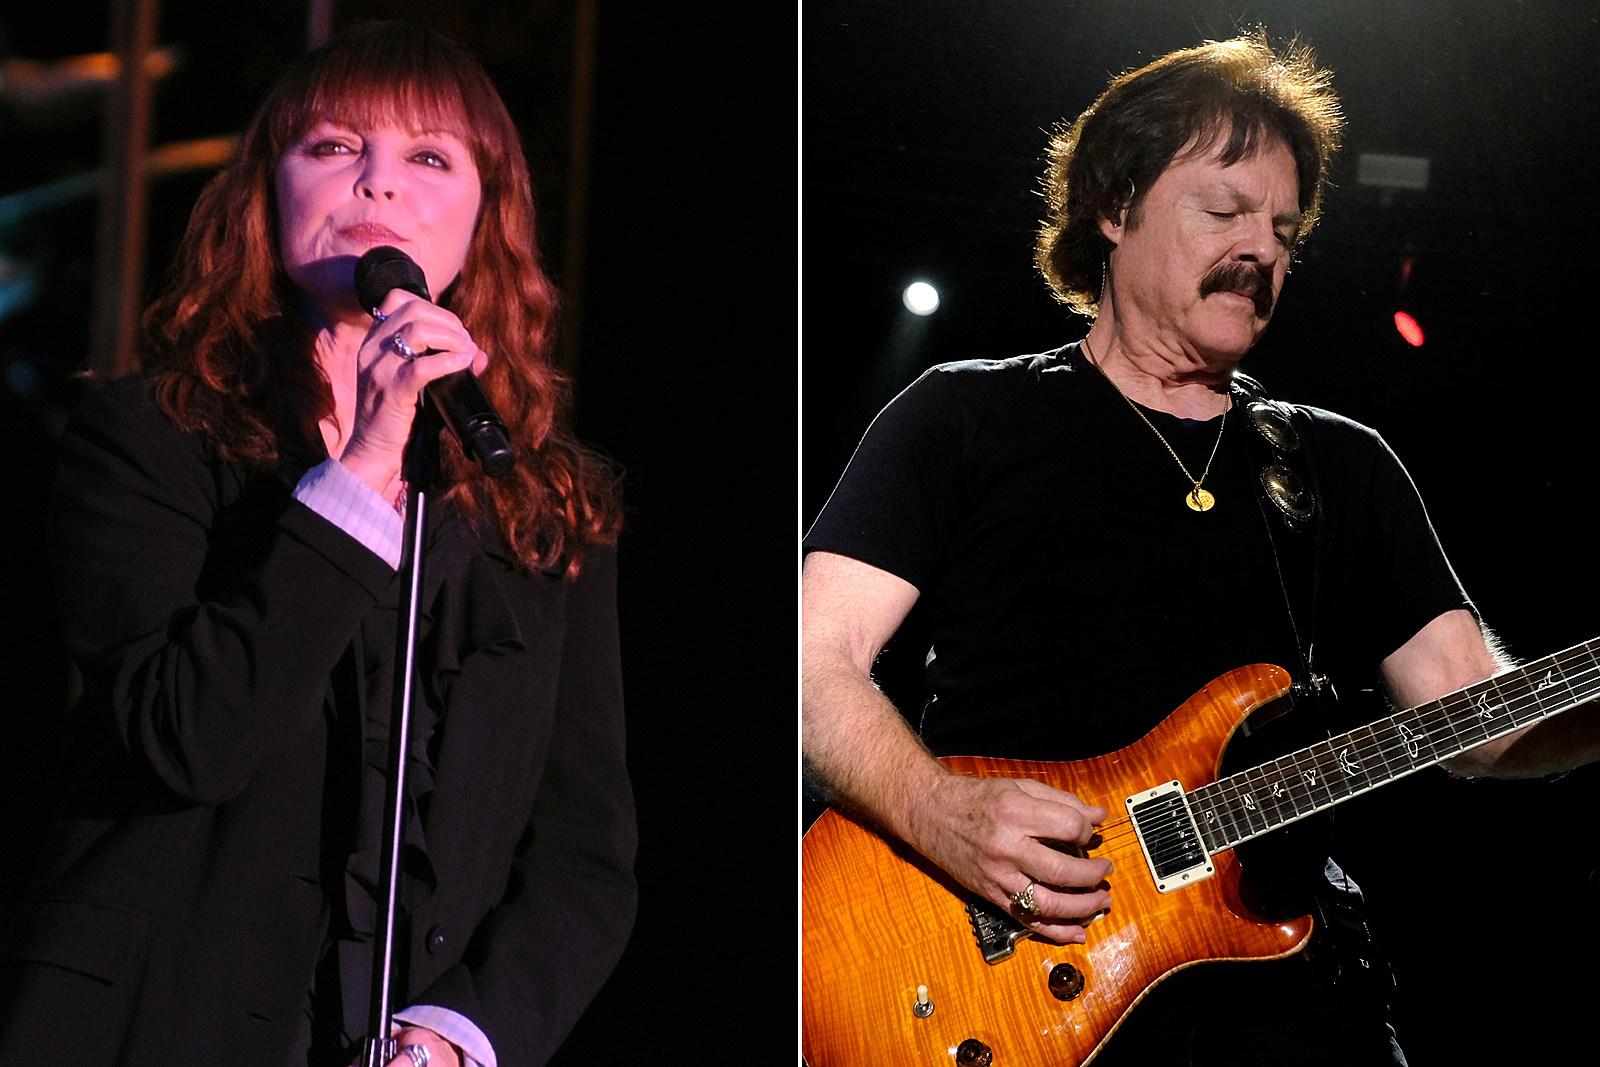 Pat Benatar, Doobie Brothers Lead First Rock Hall Fan Vote